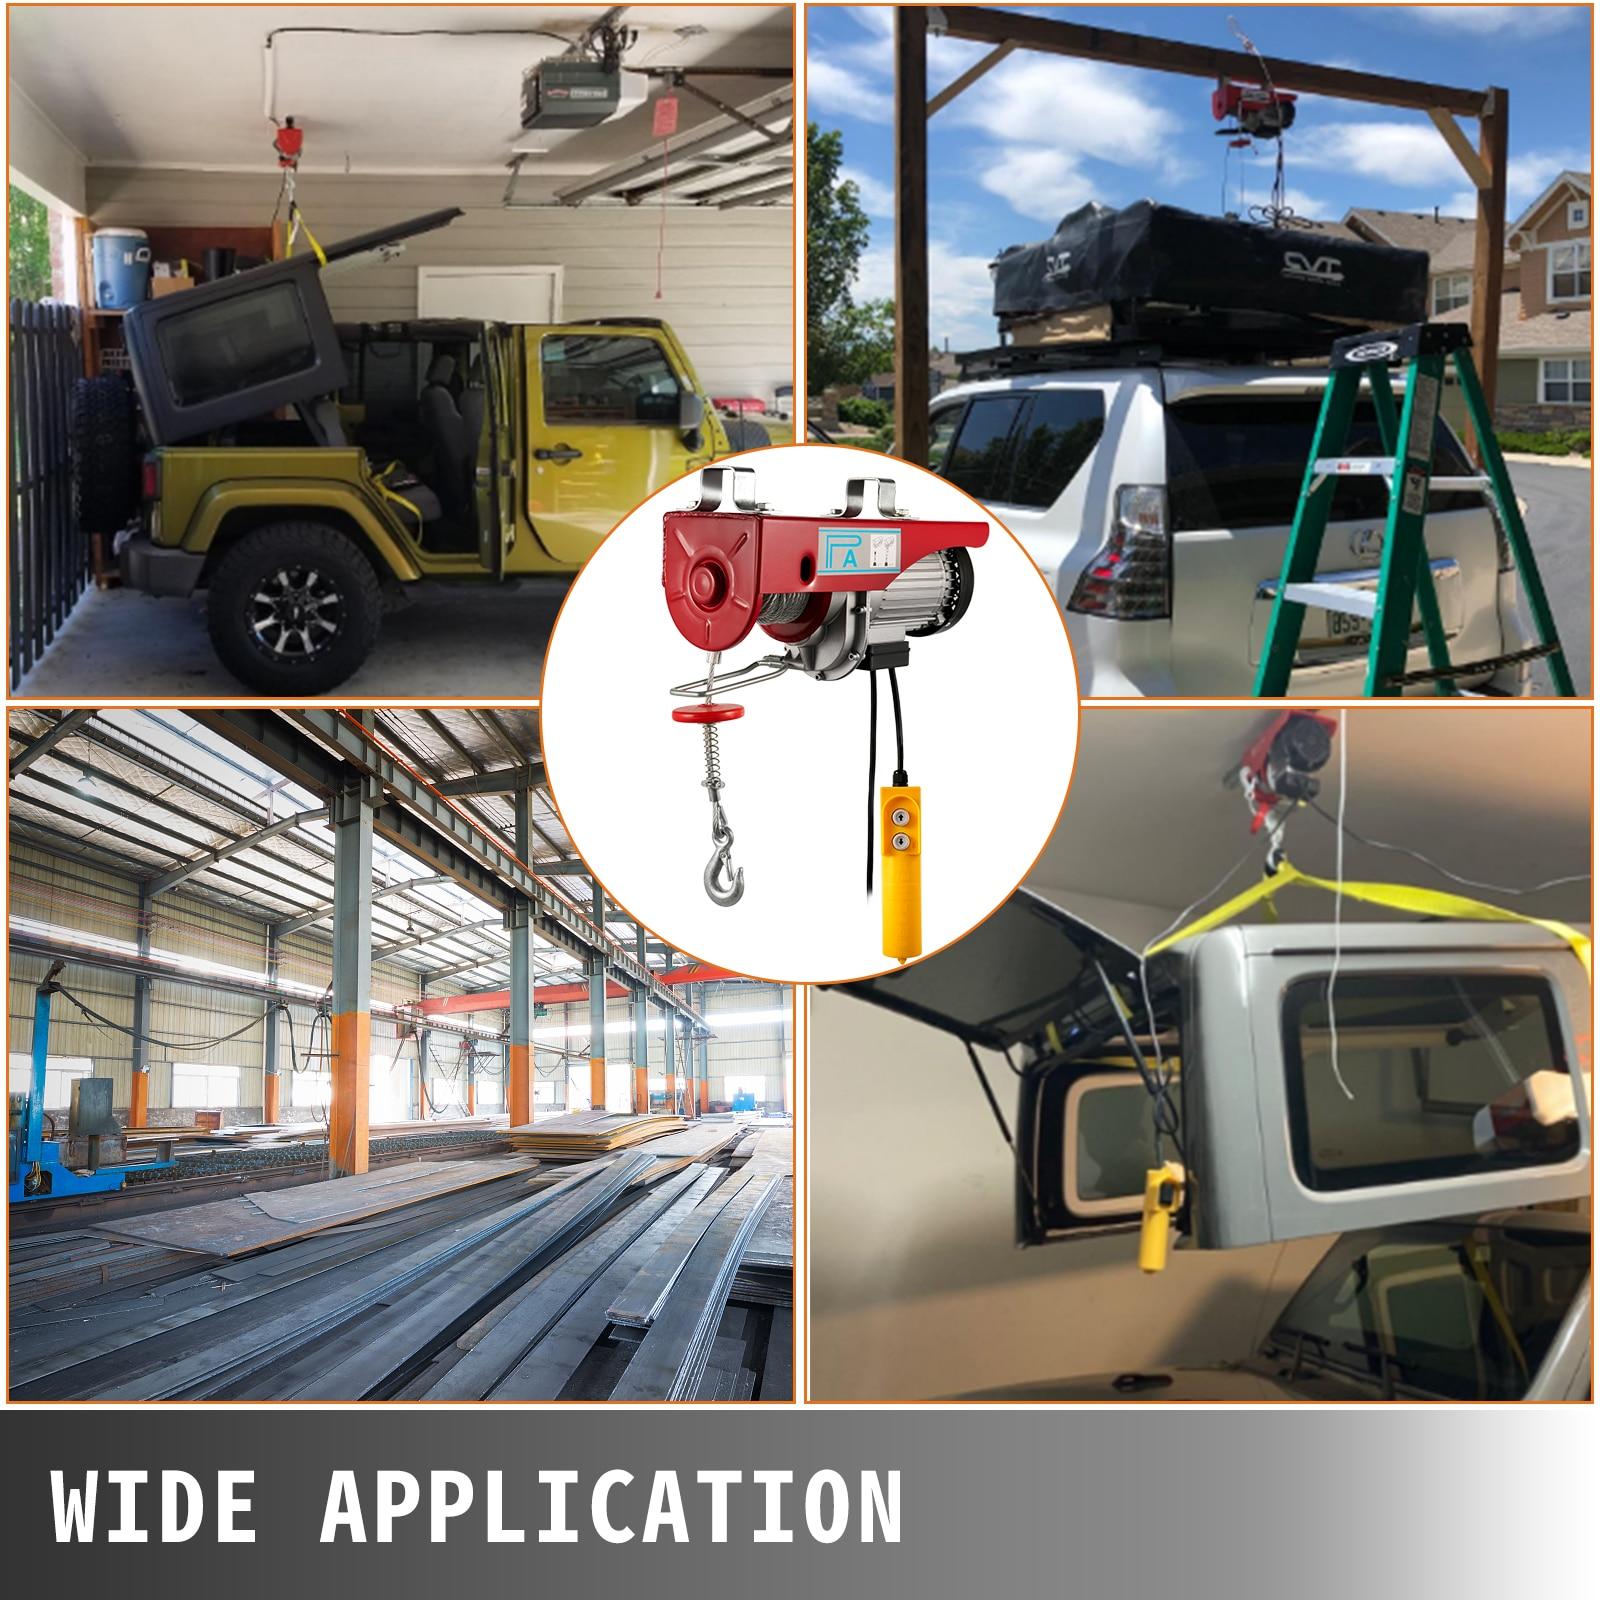 VEVOR 440 880 1320 1760lbs Electric Hoist Crane Portable Lifter Overhead Garage Winch Effort Elevator with Wired Remote Control enlarge